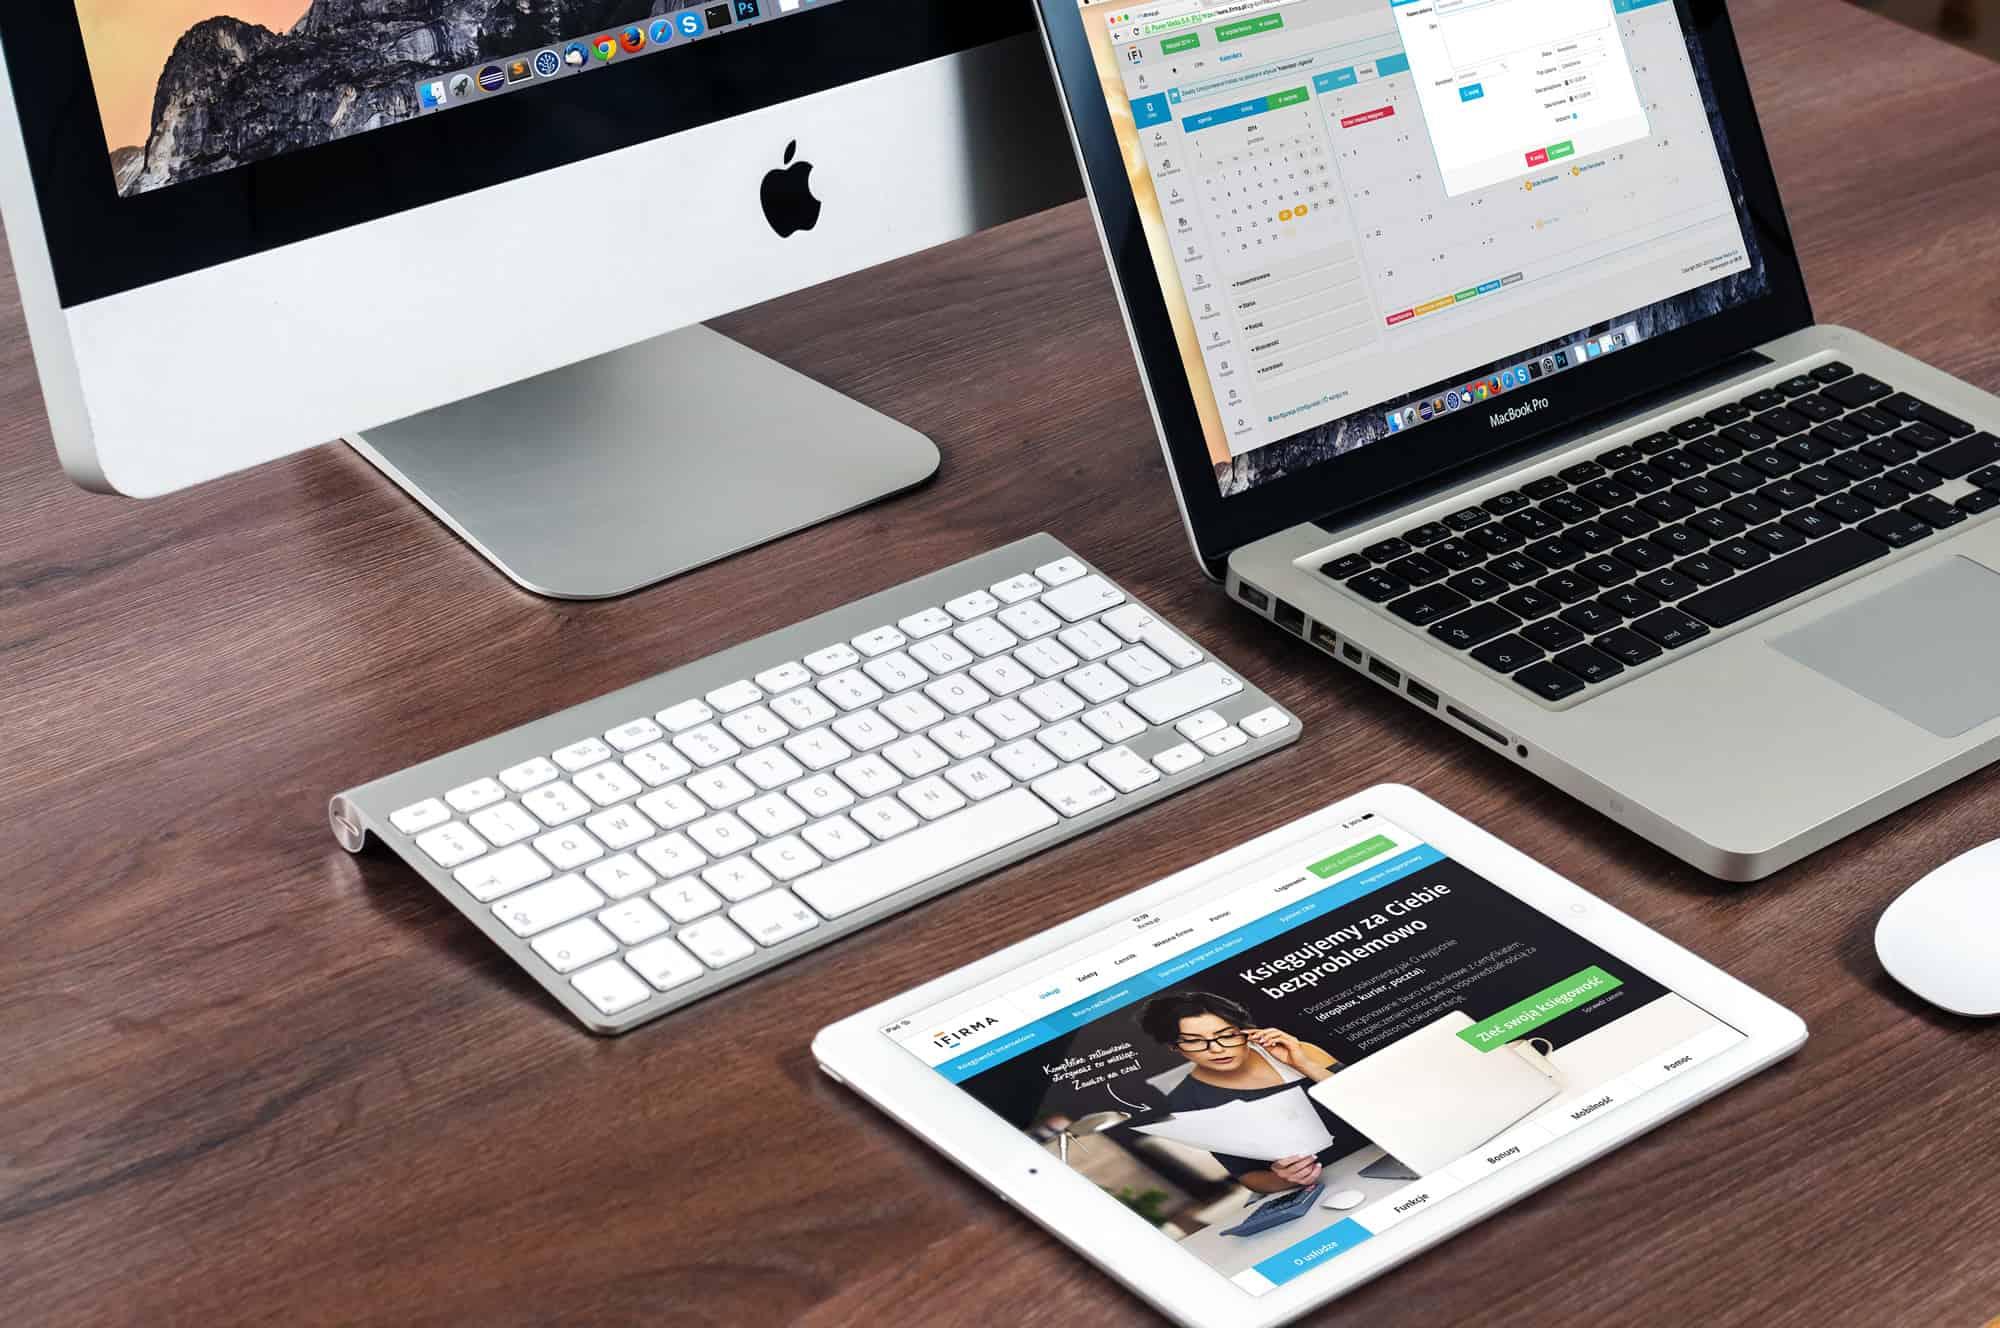 Image | desk with laptop, tablet and desktop computer